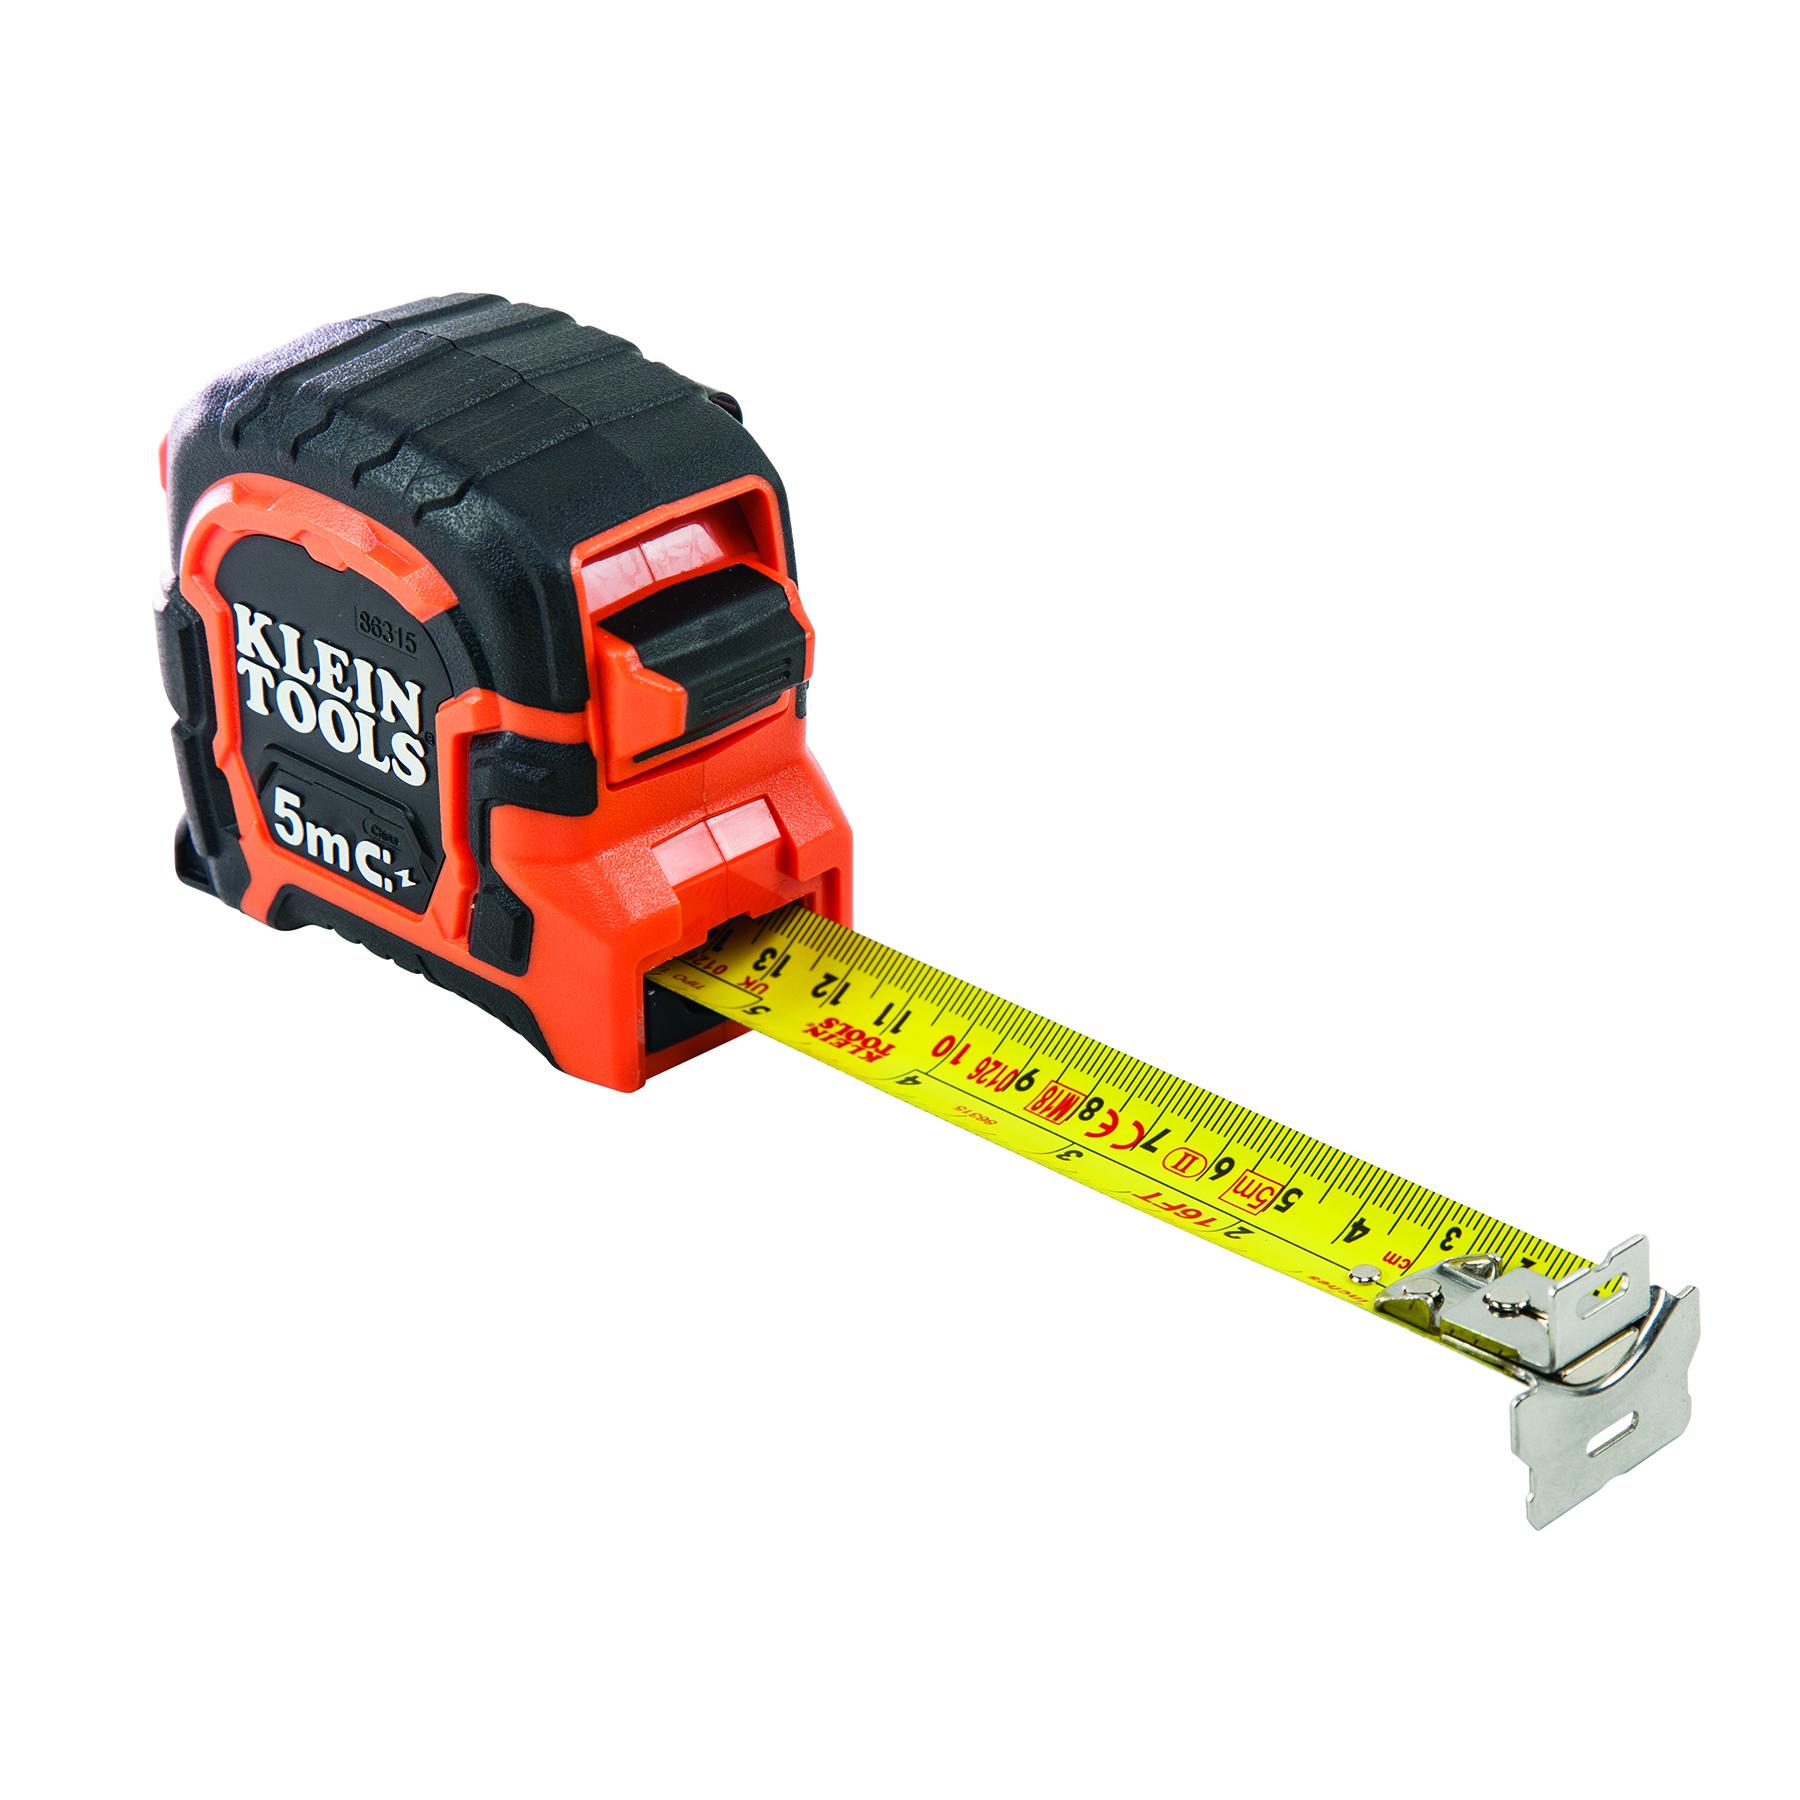 Tape Measure 5m Magnetic Double Hook Metric Sae 86315